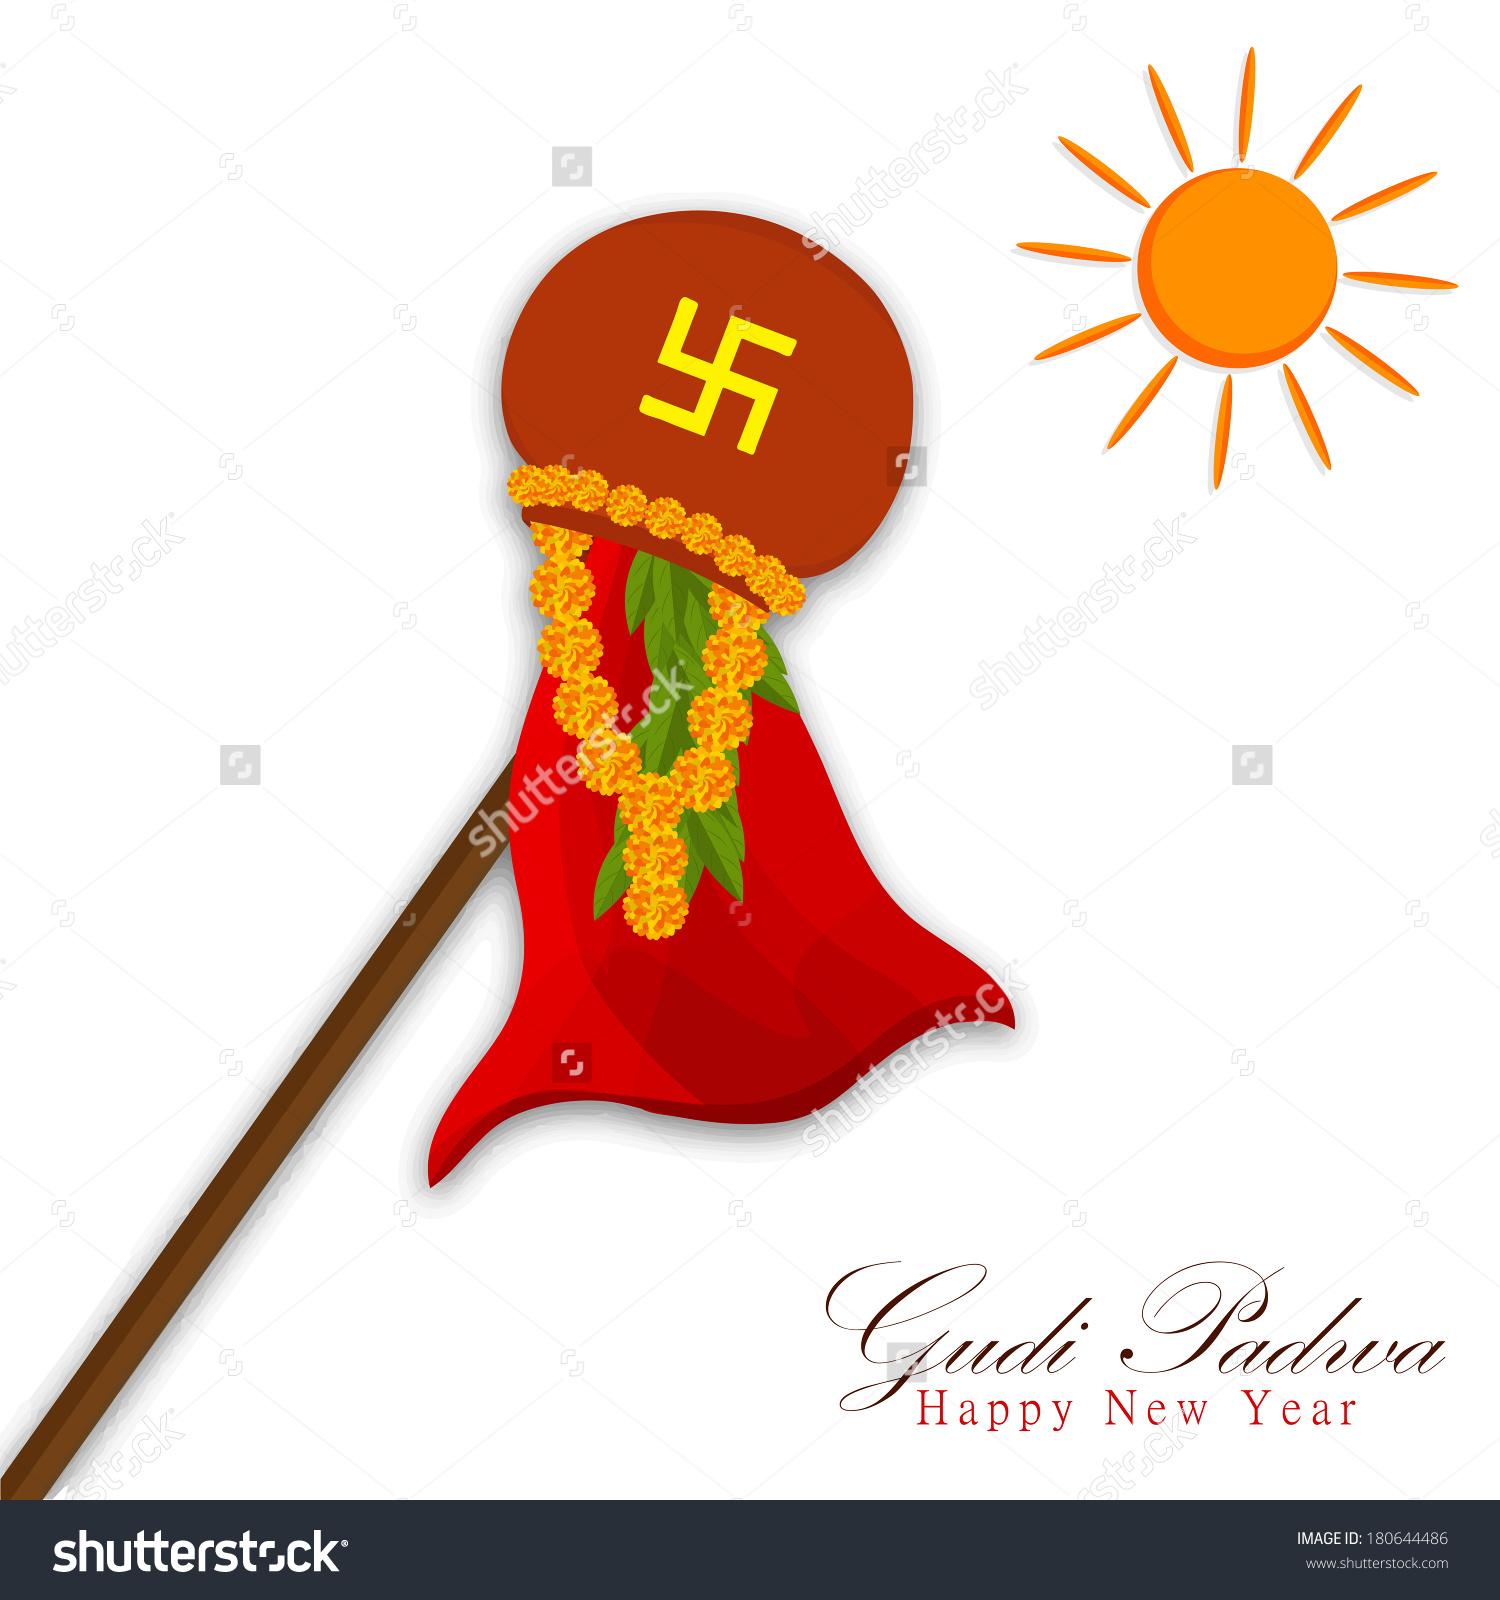 Gudi padva marathi clipart.